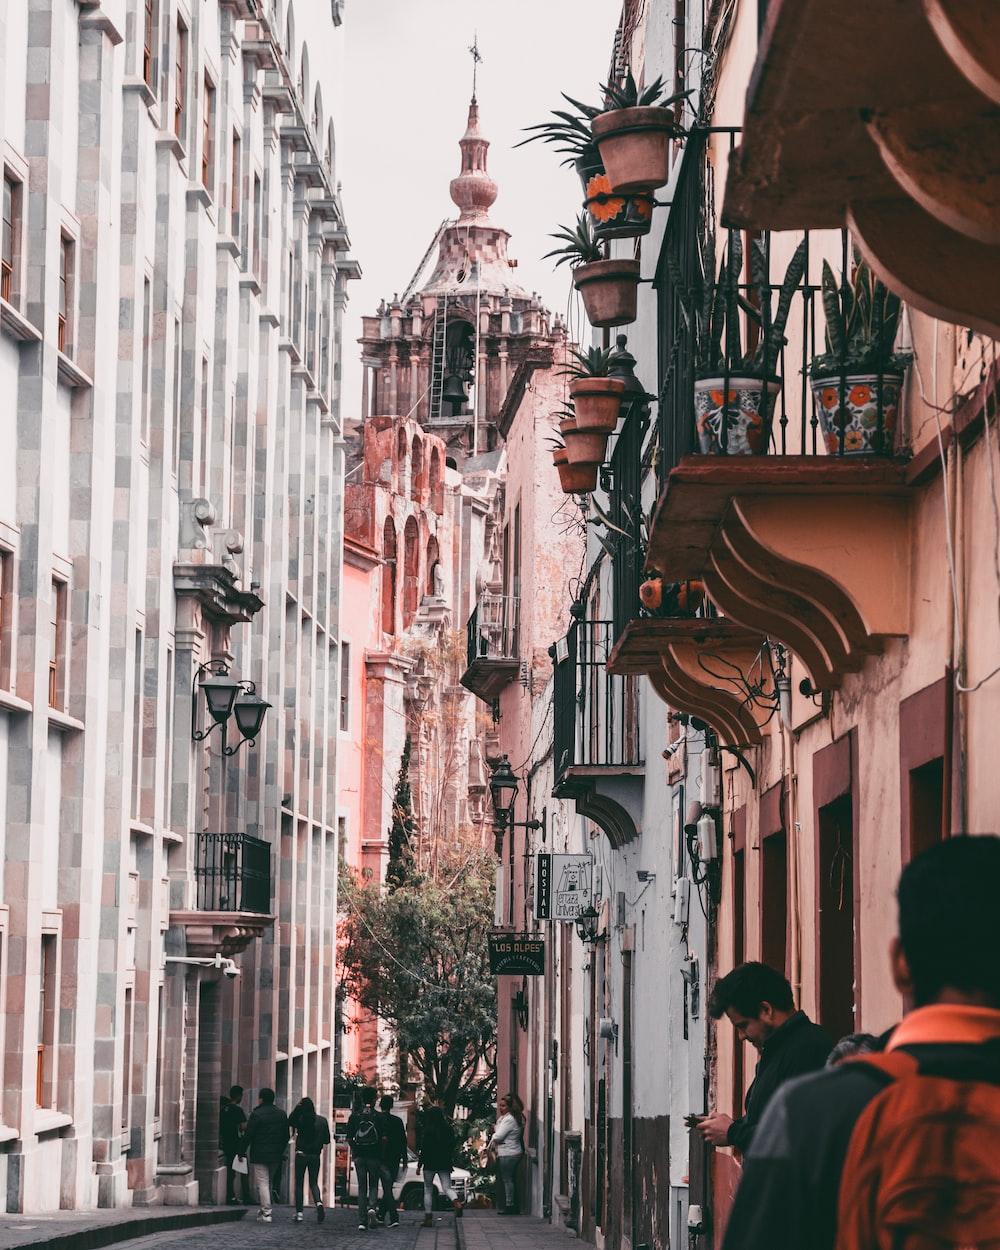 people walking at alley during daytime